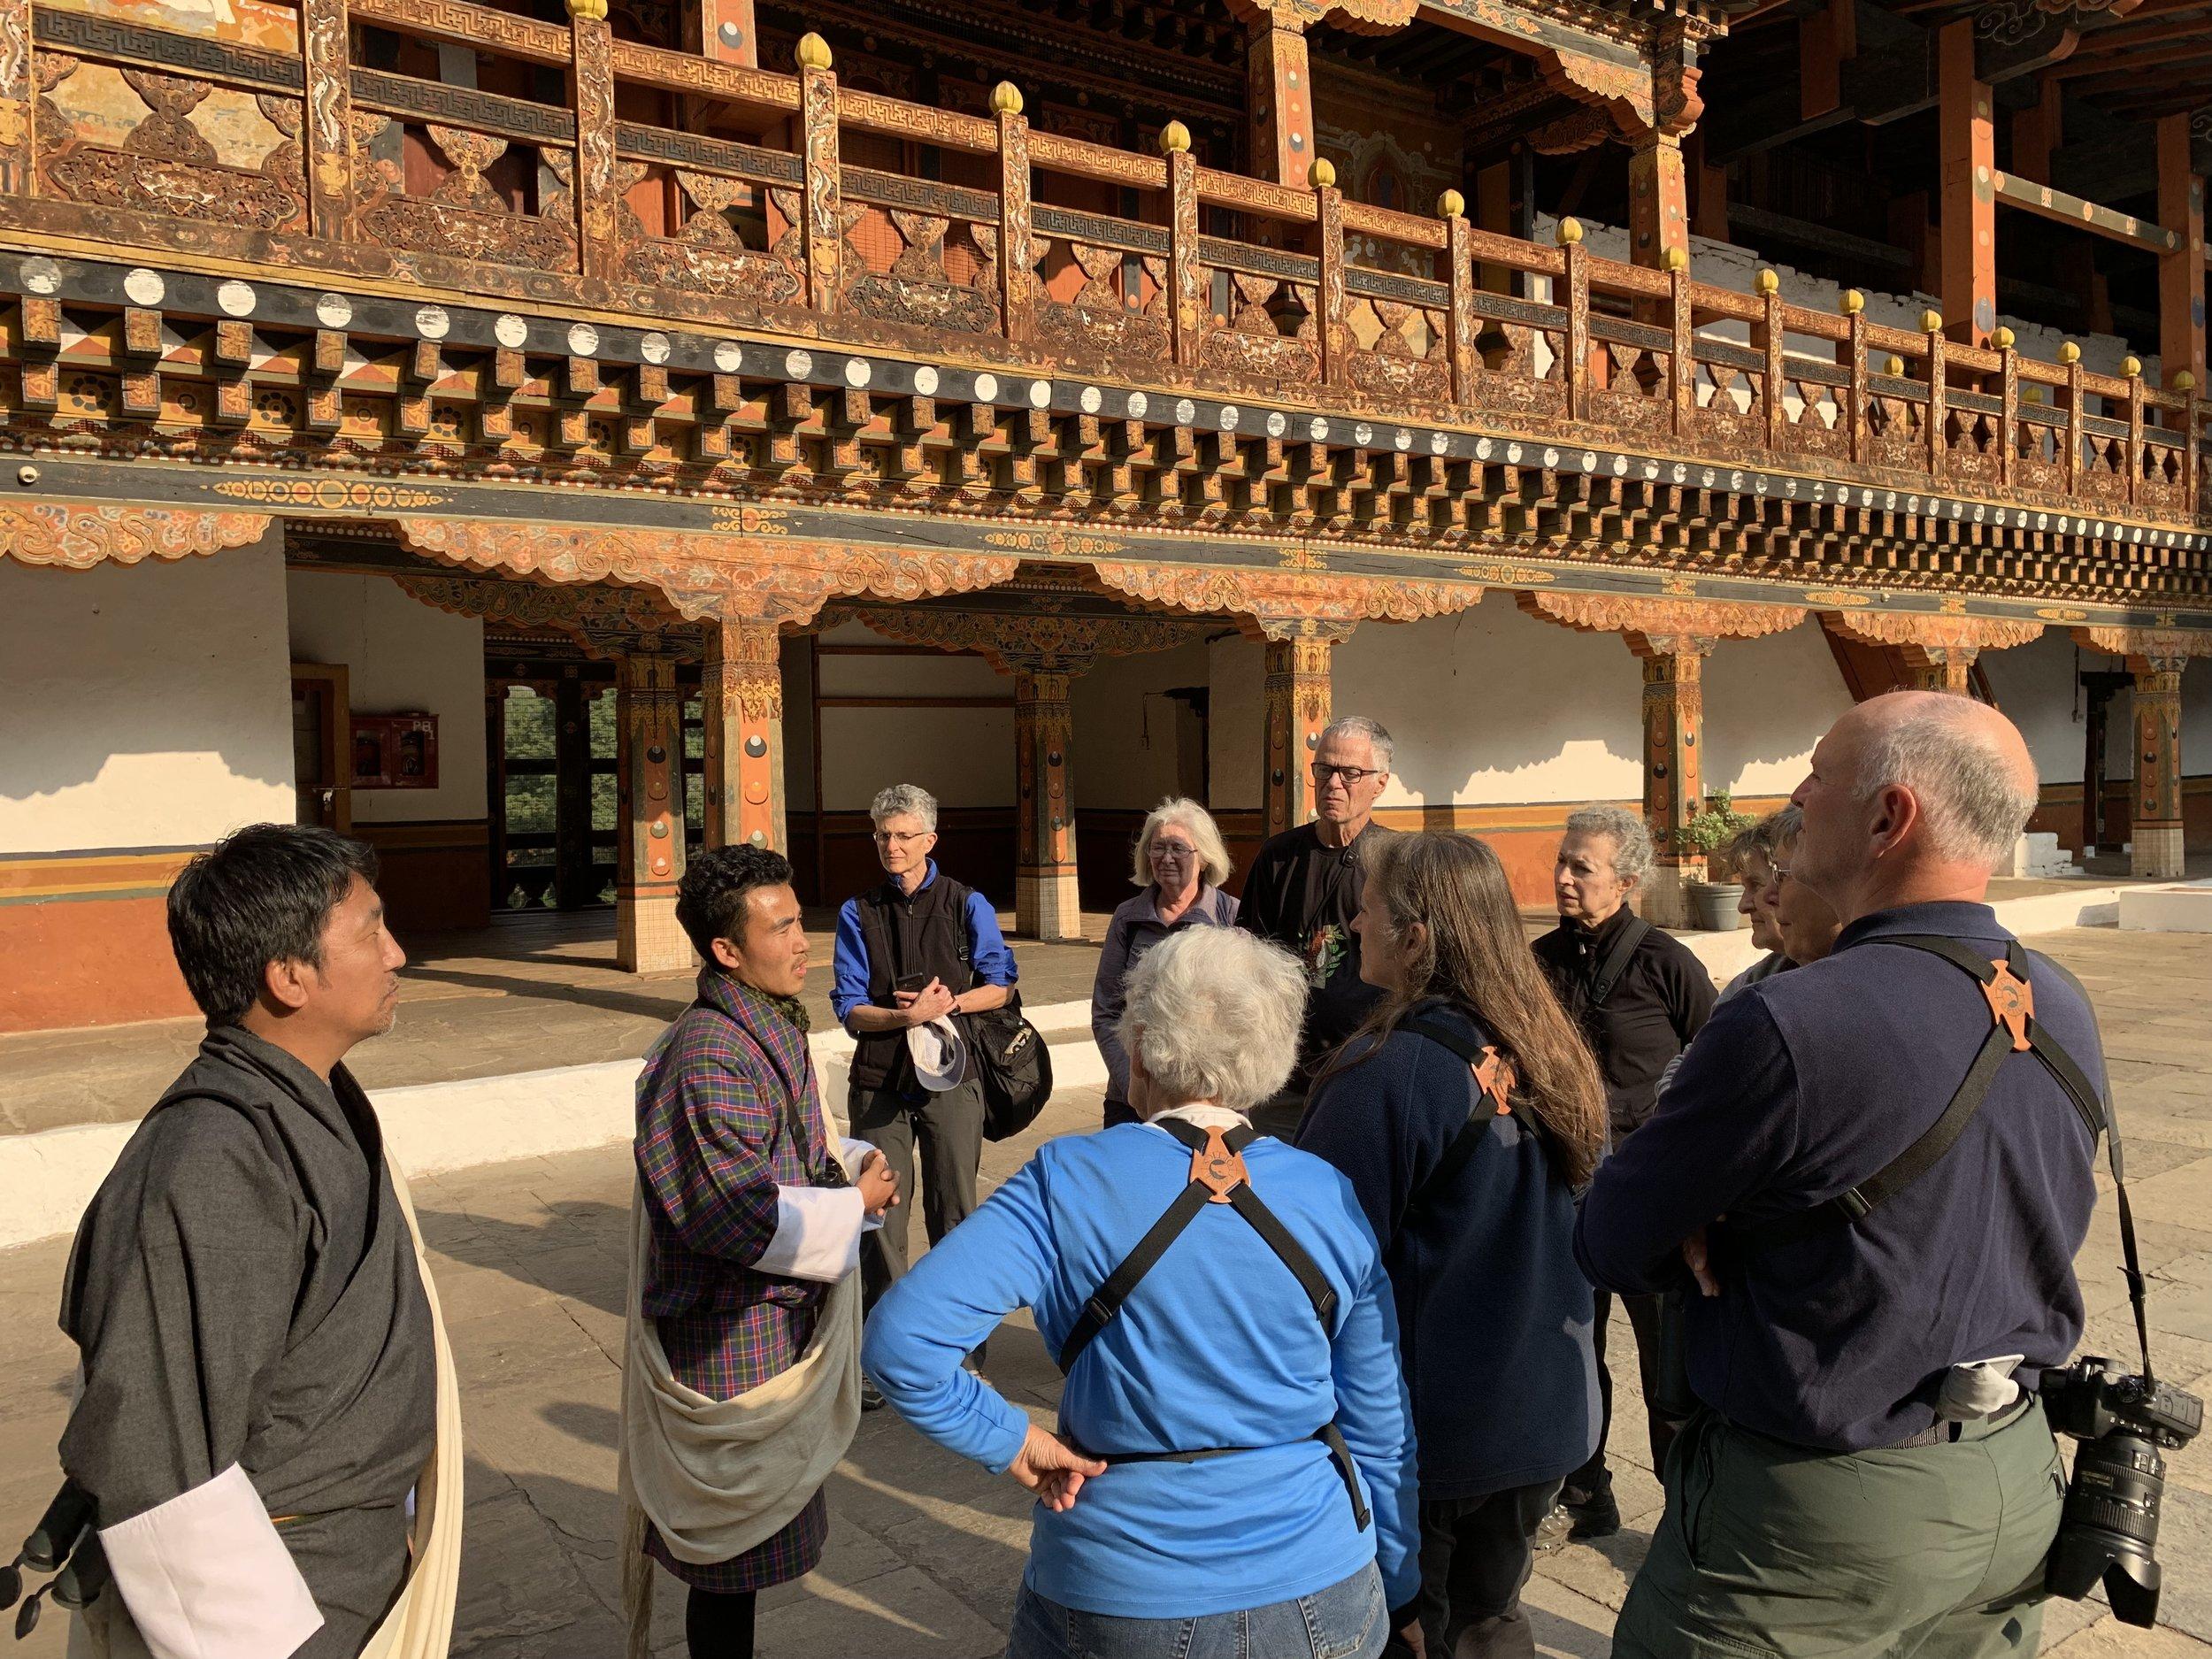 A cultural interlude, visiting Punakha Dzong, during our spectacular November Bhutan tour.